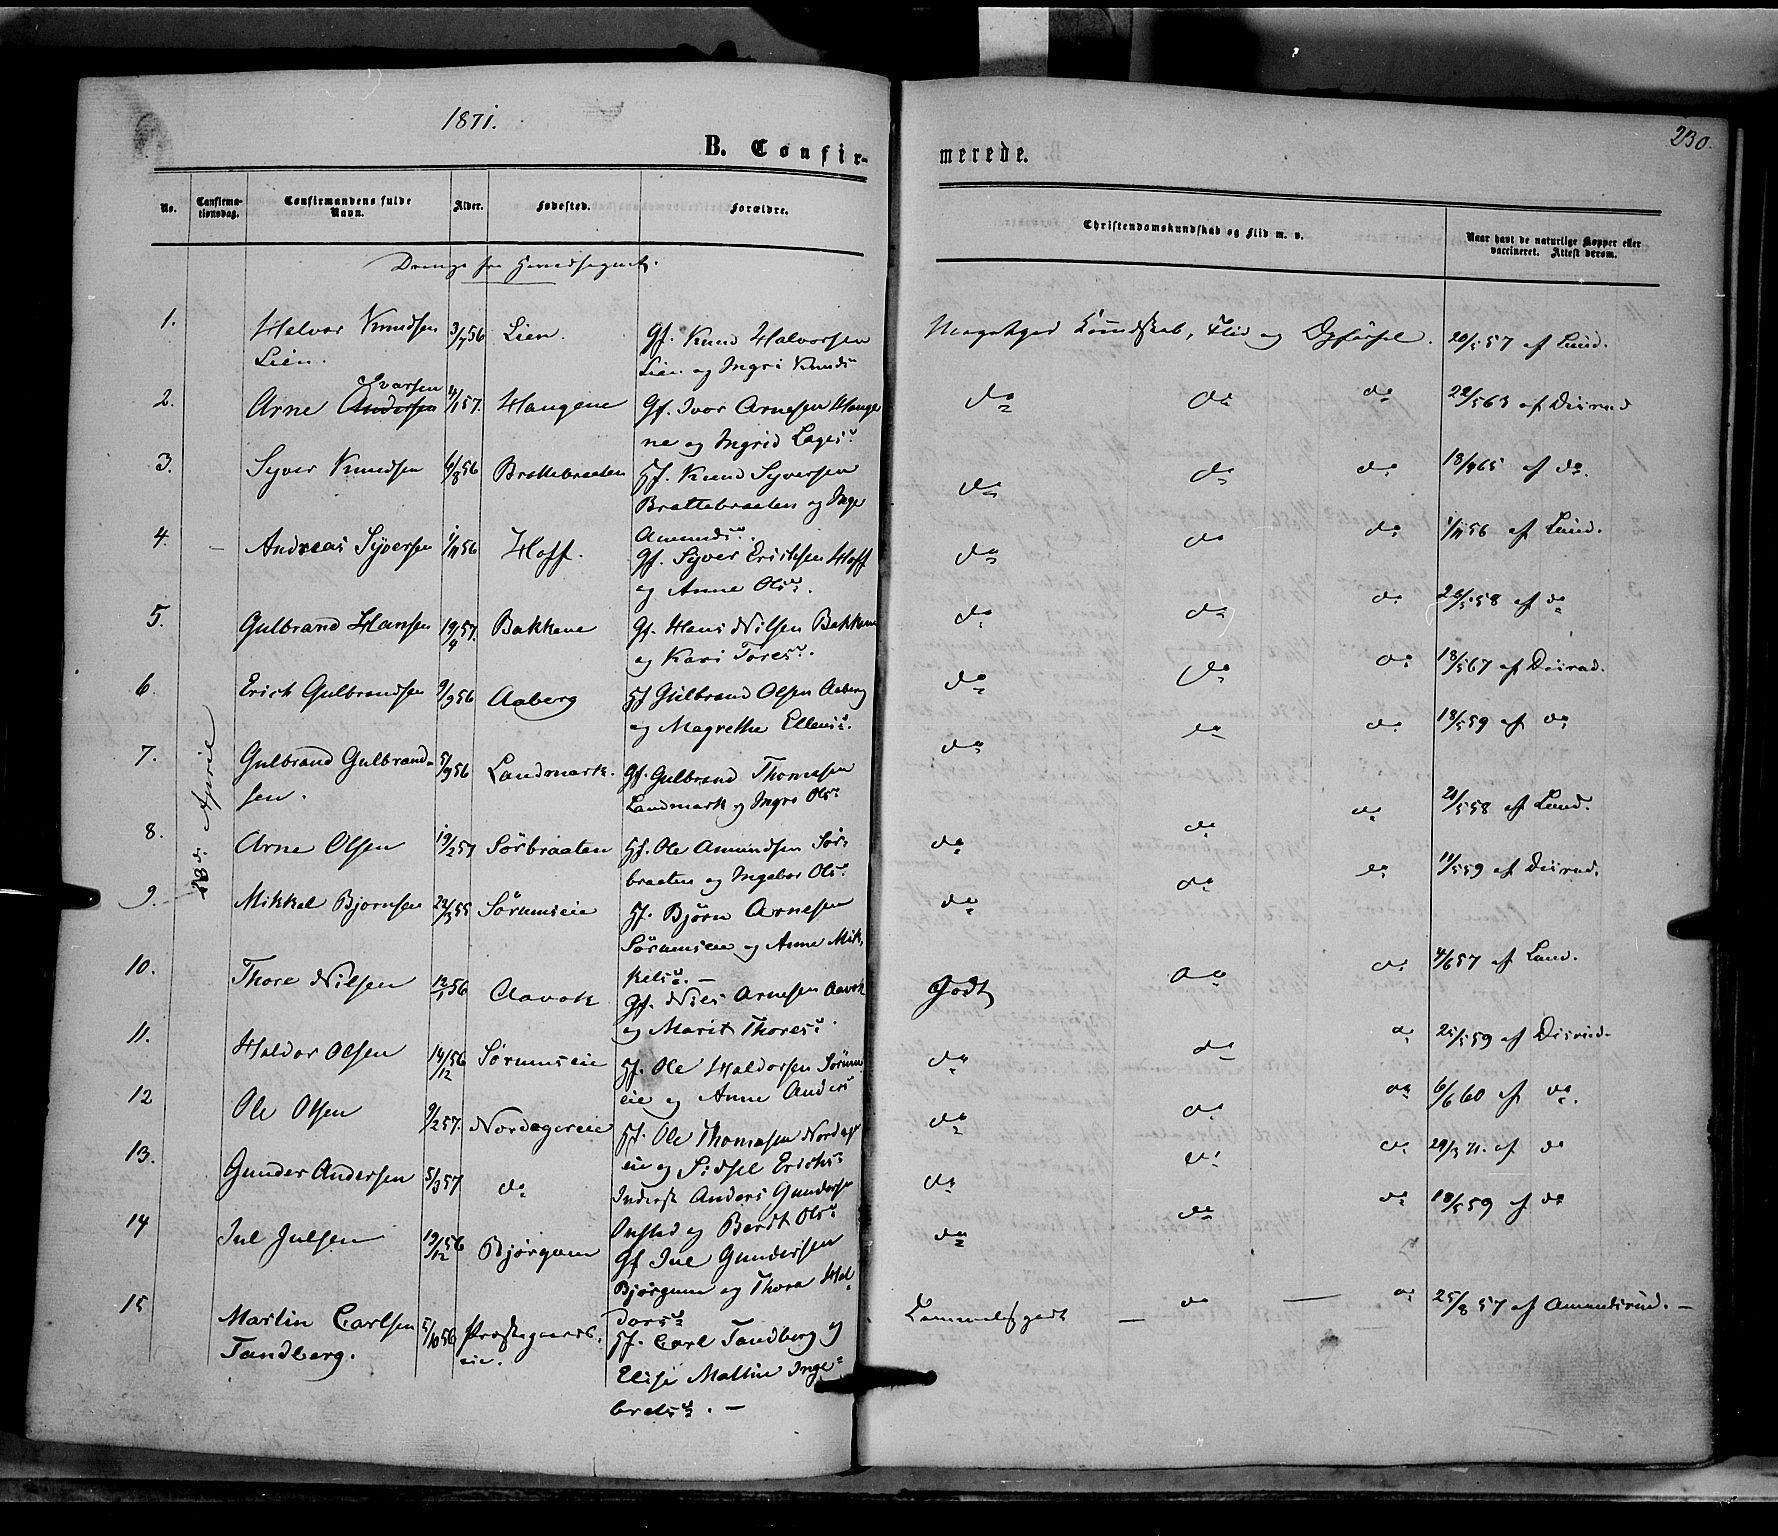 SAH, Nord-Aurdal prestekontor, Ministerialbok nr. 8, 1863-1875, s. 230